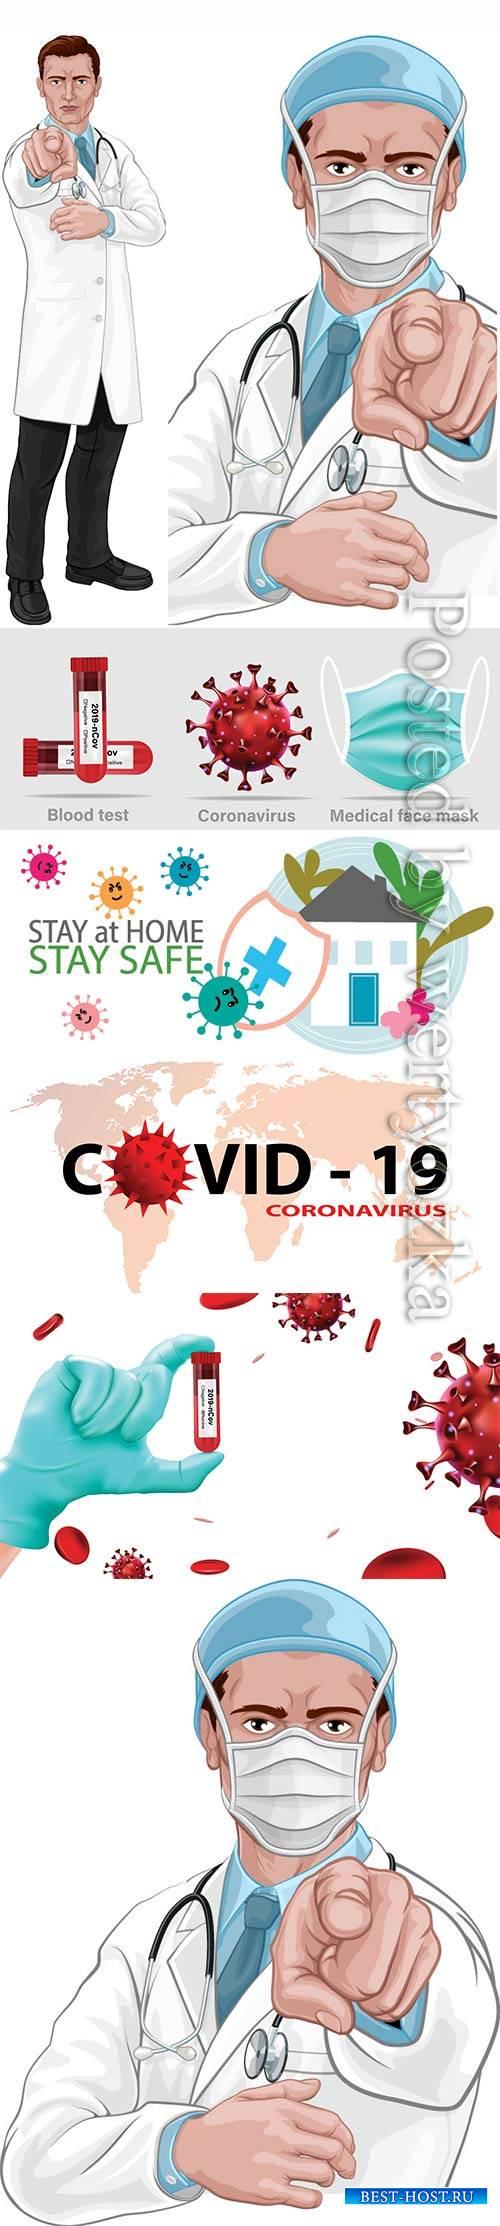 COVID 19, Coranavirus vector illustration sets # 25